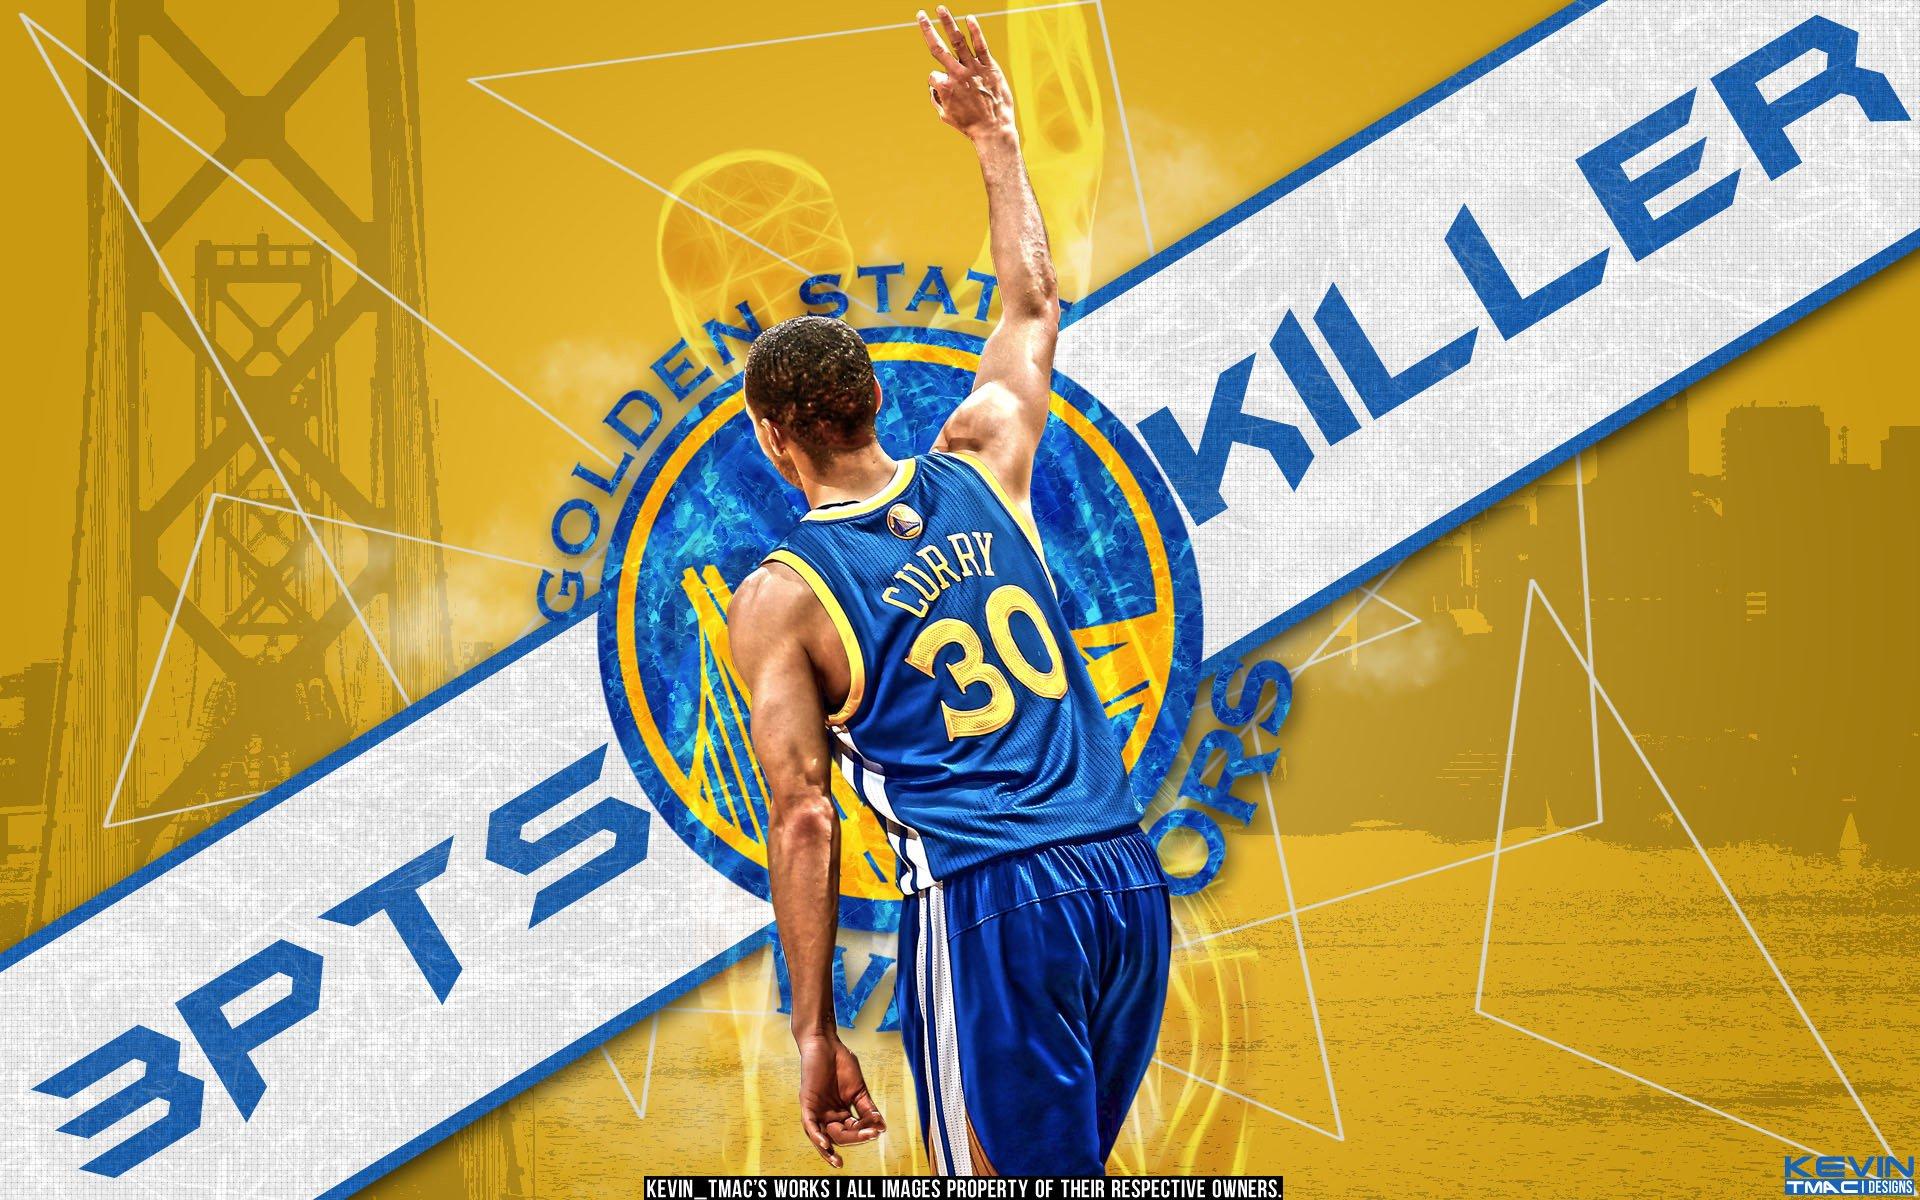 44 Curry Basketball Wallpaper On Wallpapersafari